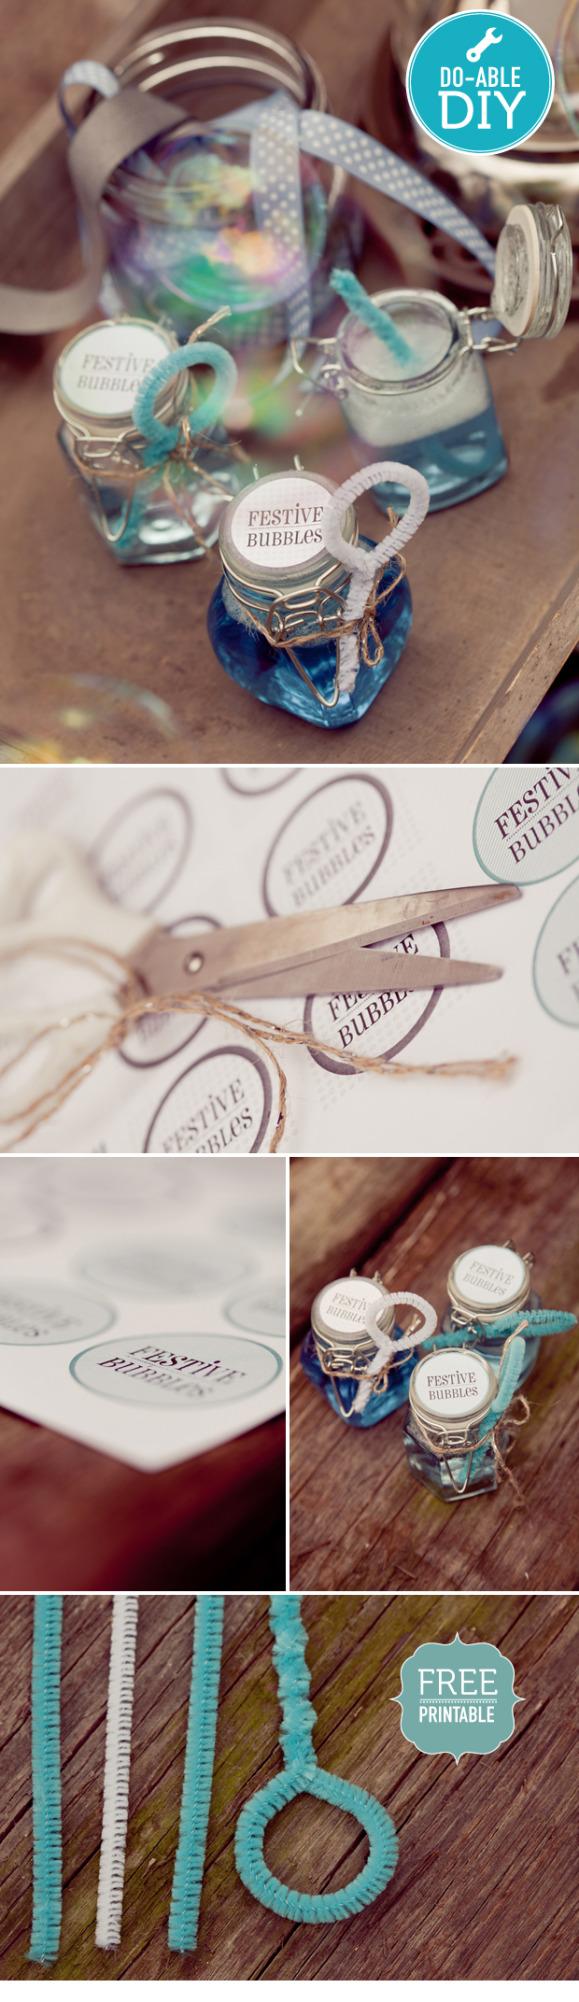 ELEPHANTSHOE_DIY_BUBBLES.jpg